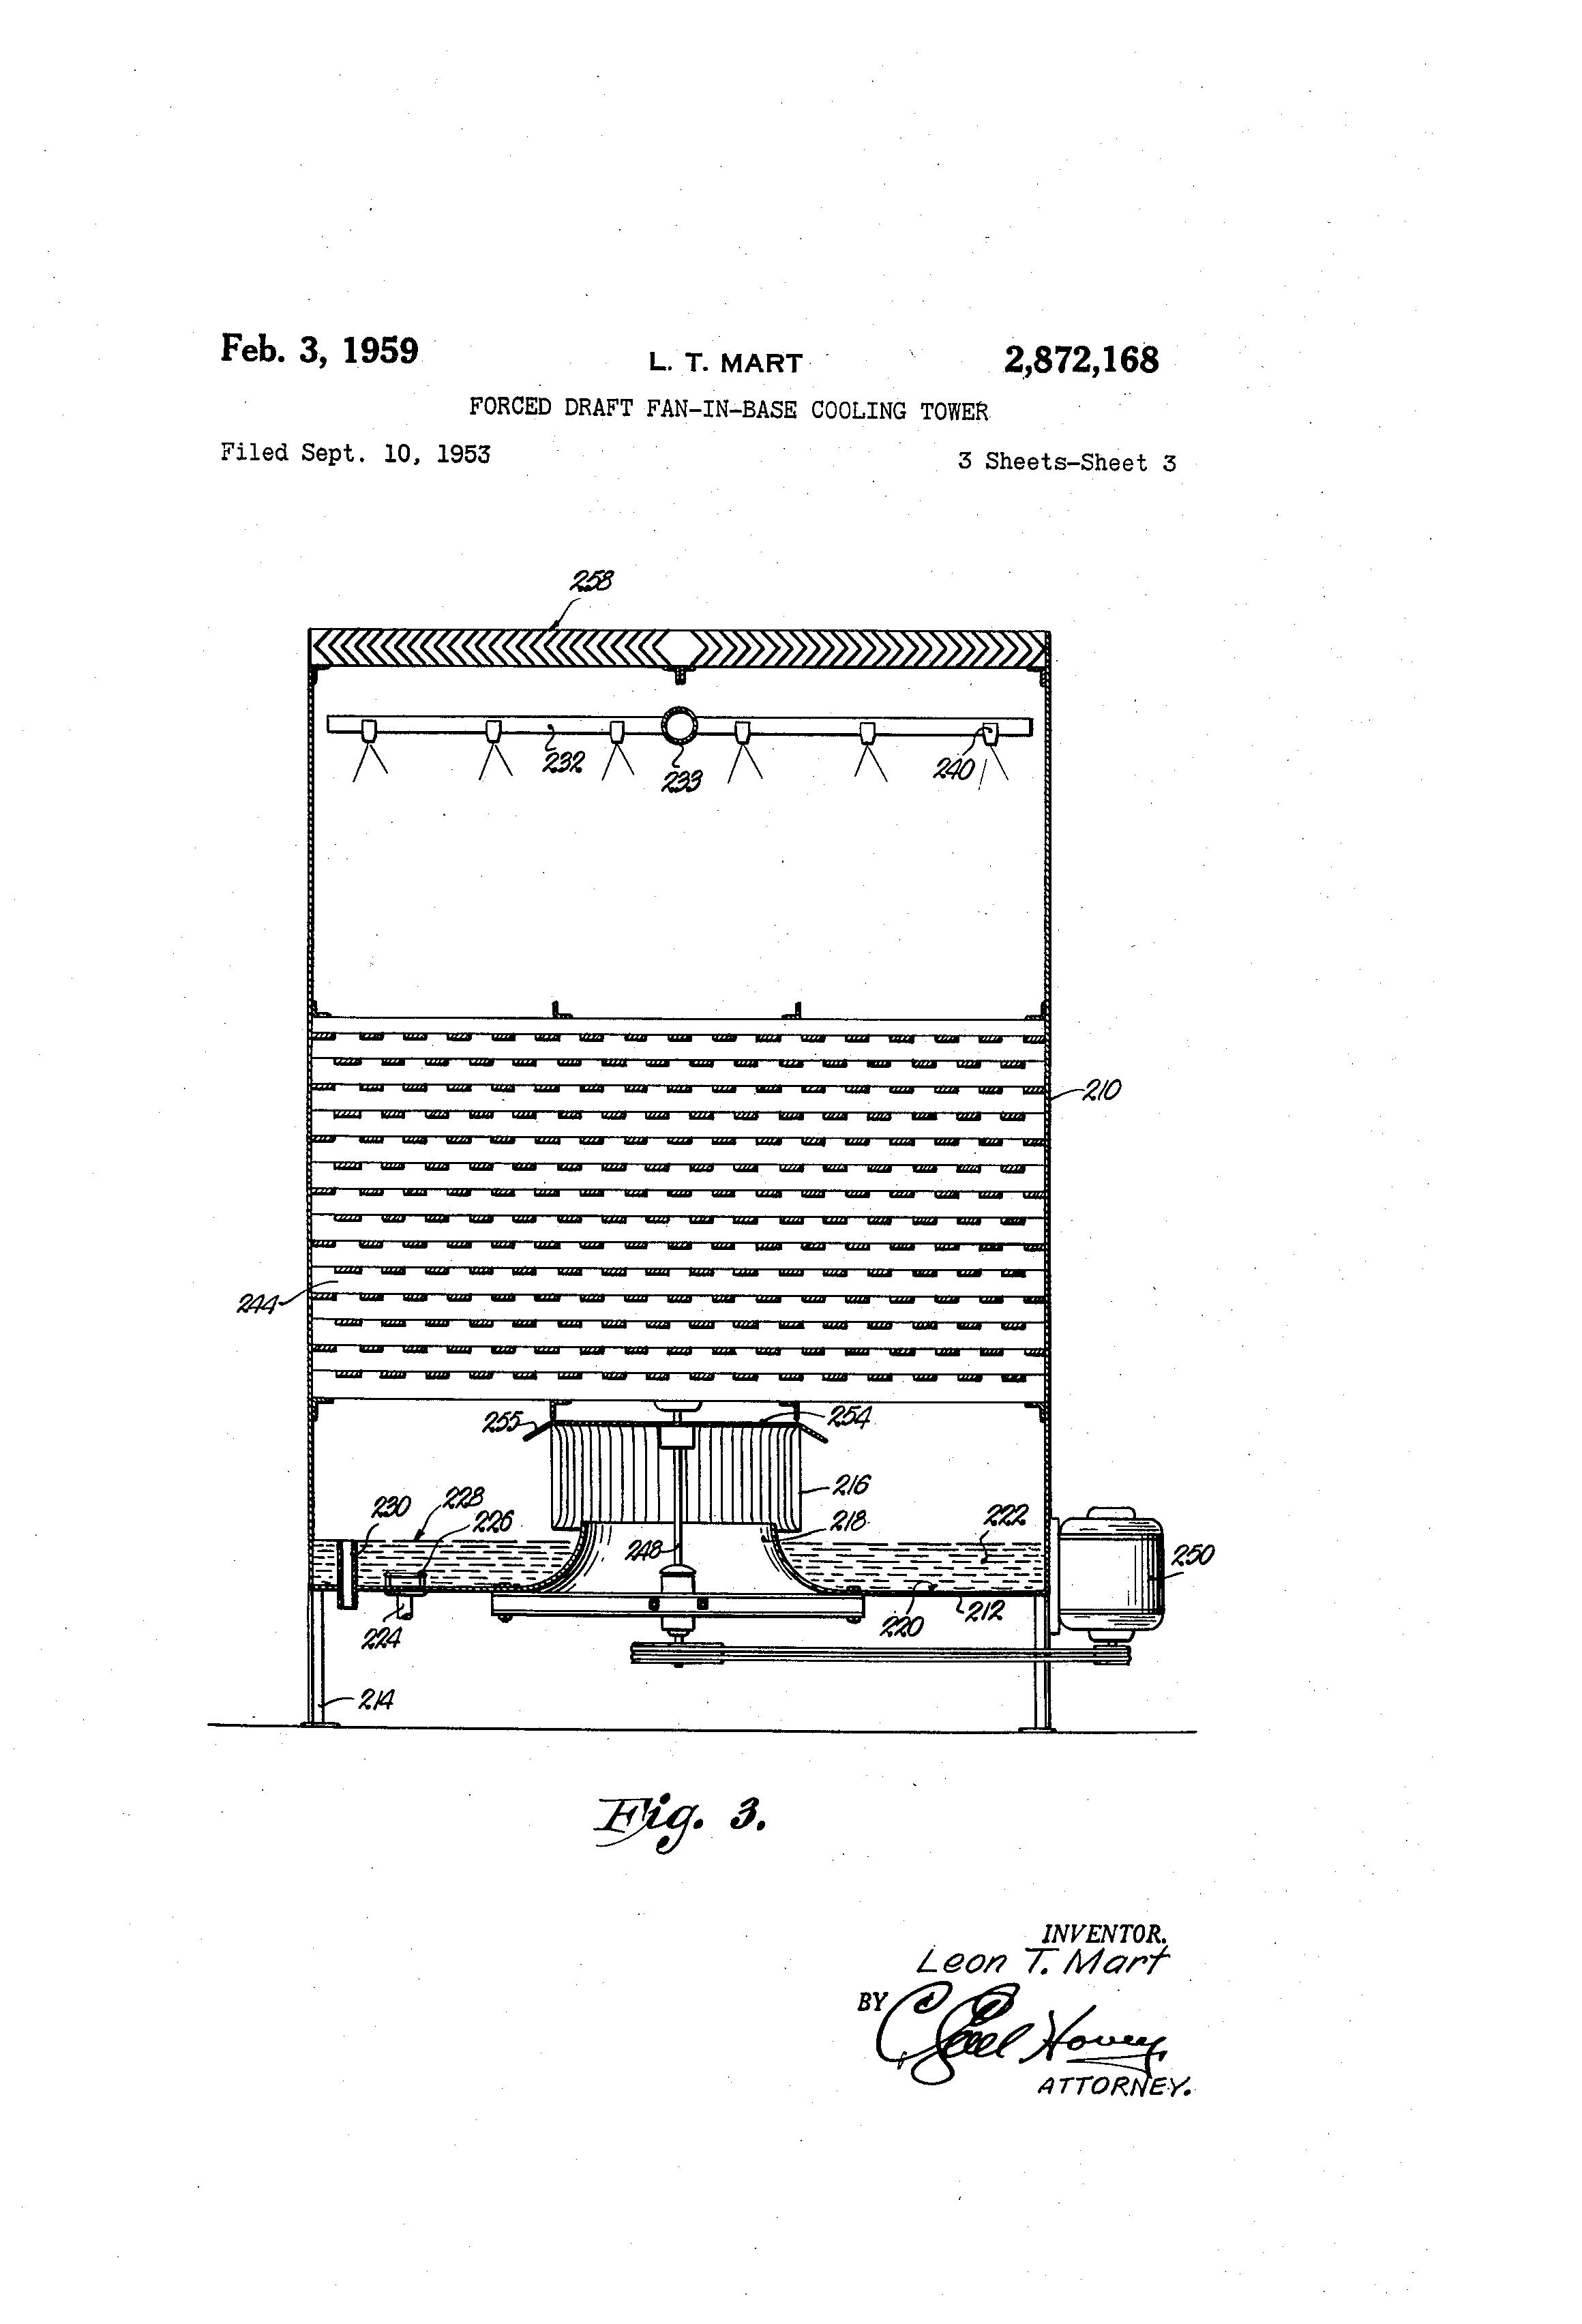 Forced Draft Fan : Patent us forced draft fan in base cooling tower